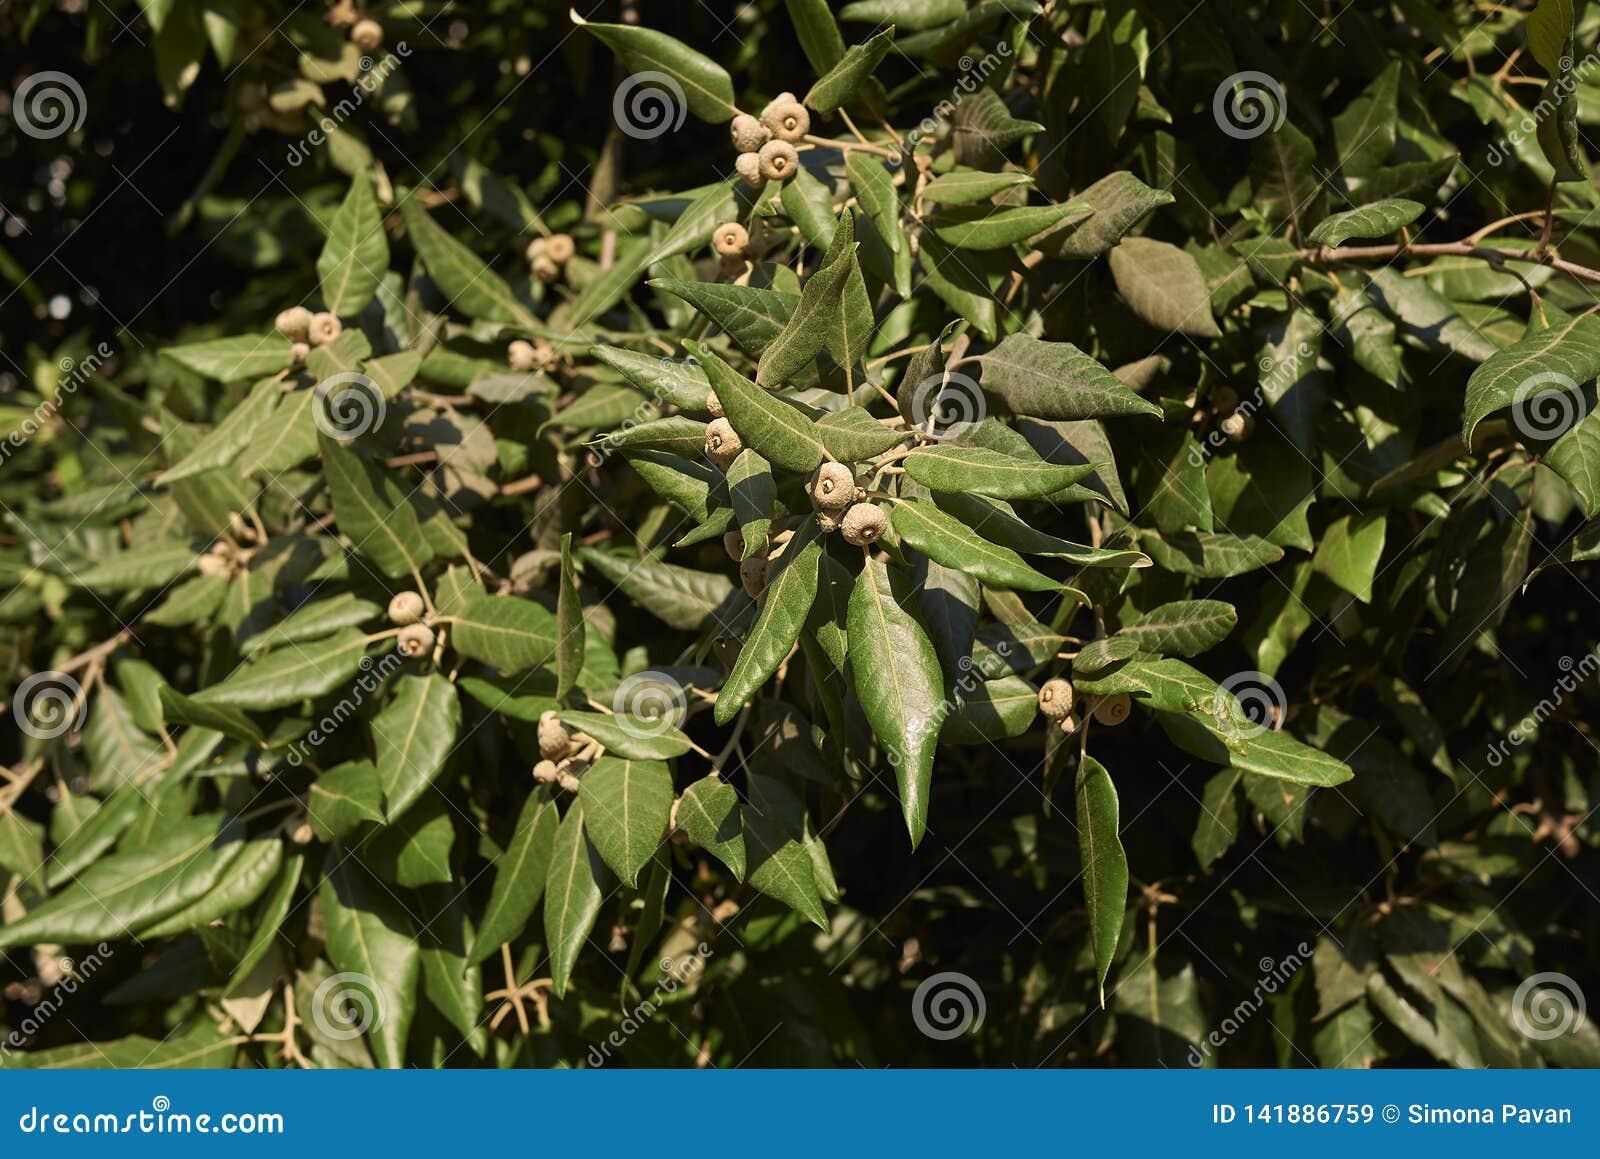 Quercusilexfilial med nya ekollonar